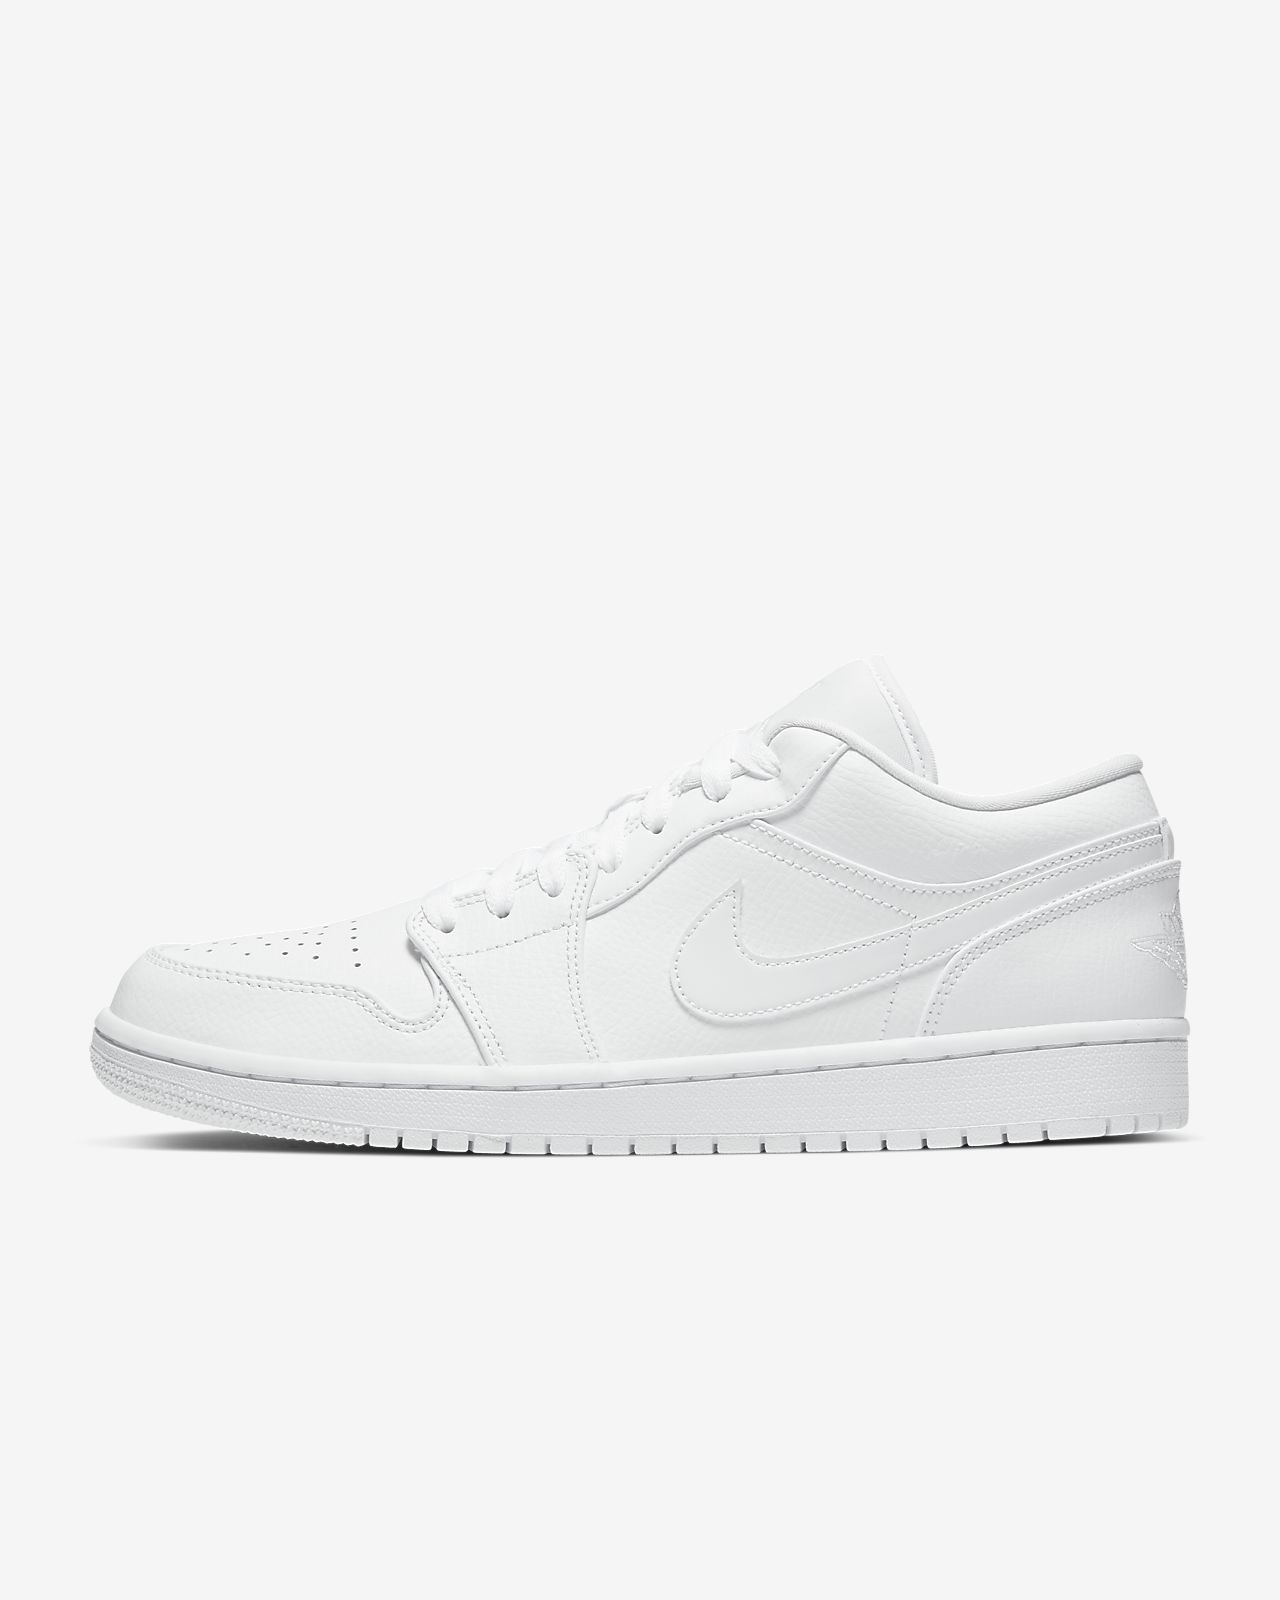 Perfekt Nike Air Jordan 1 Low Schuhe Basketball Sport